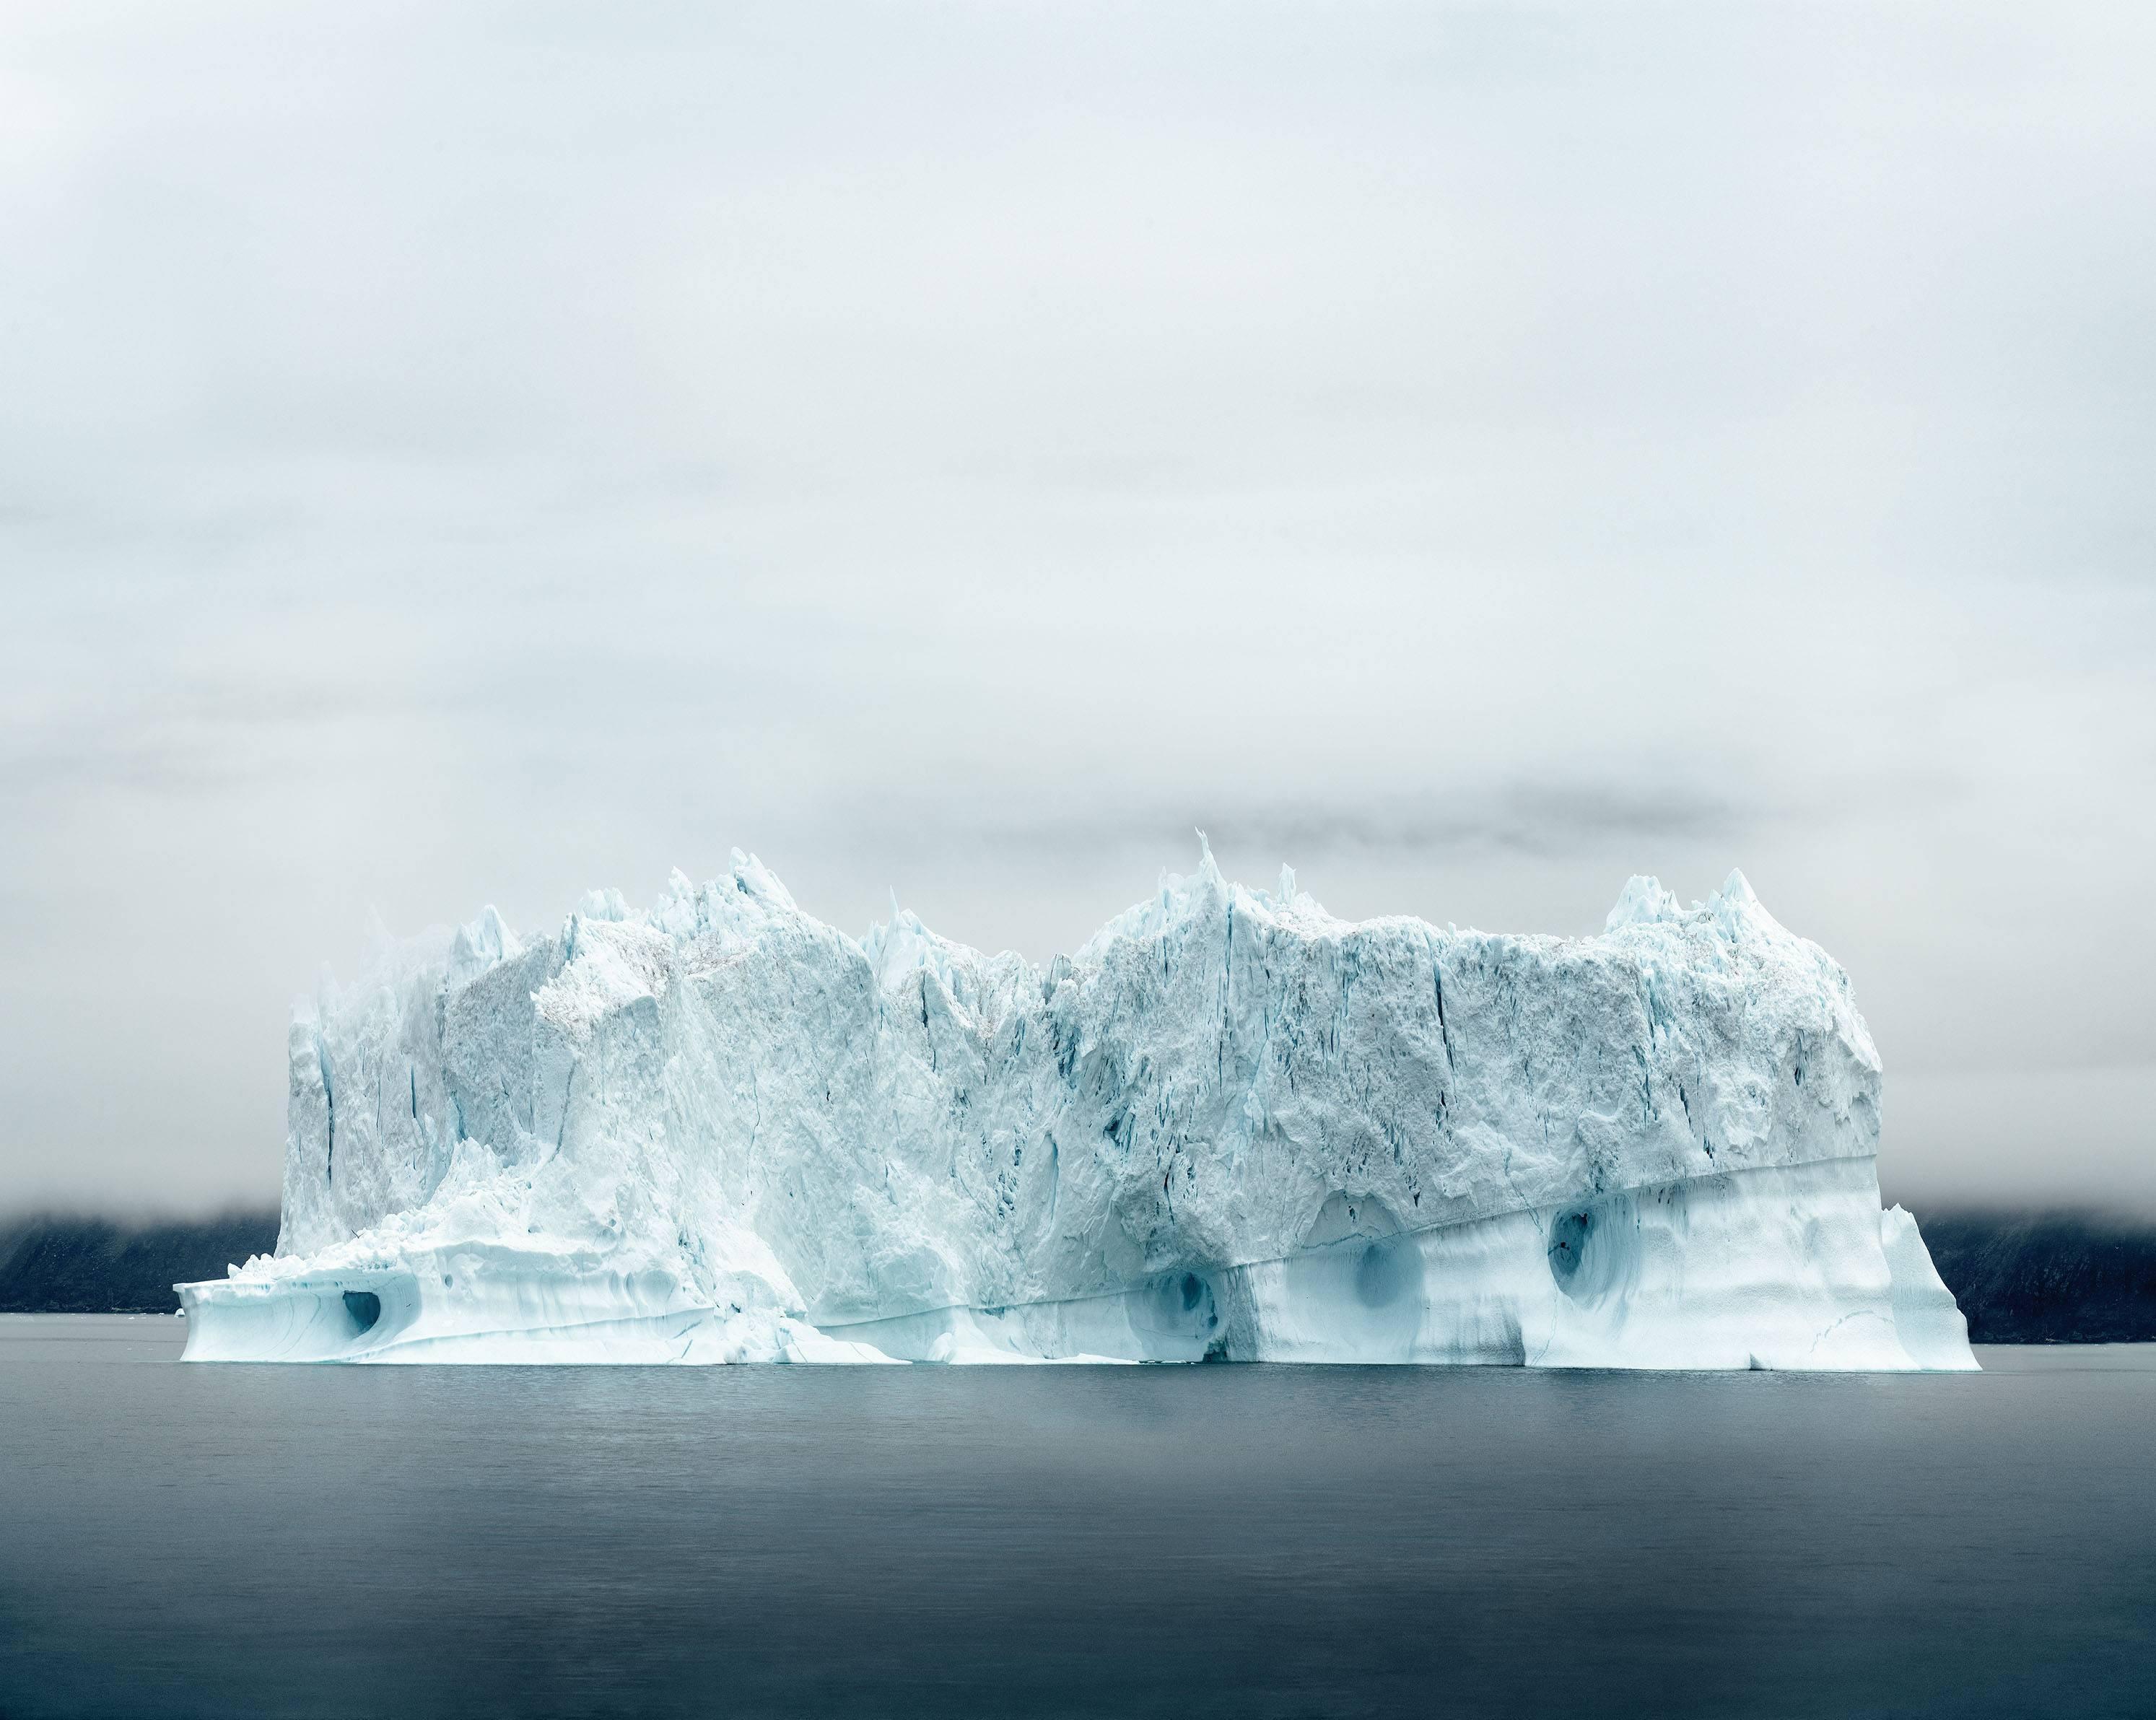 Ilulissat 06, 07/2014 - Olaf Otto Becker (Landscape Colour Photography)